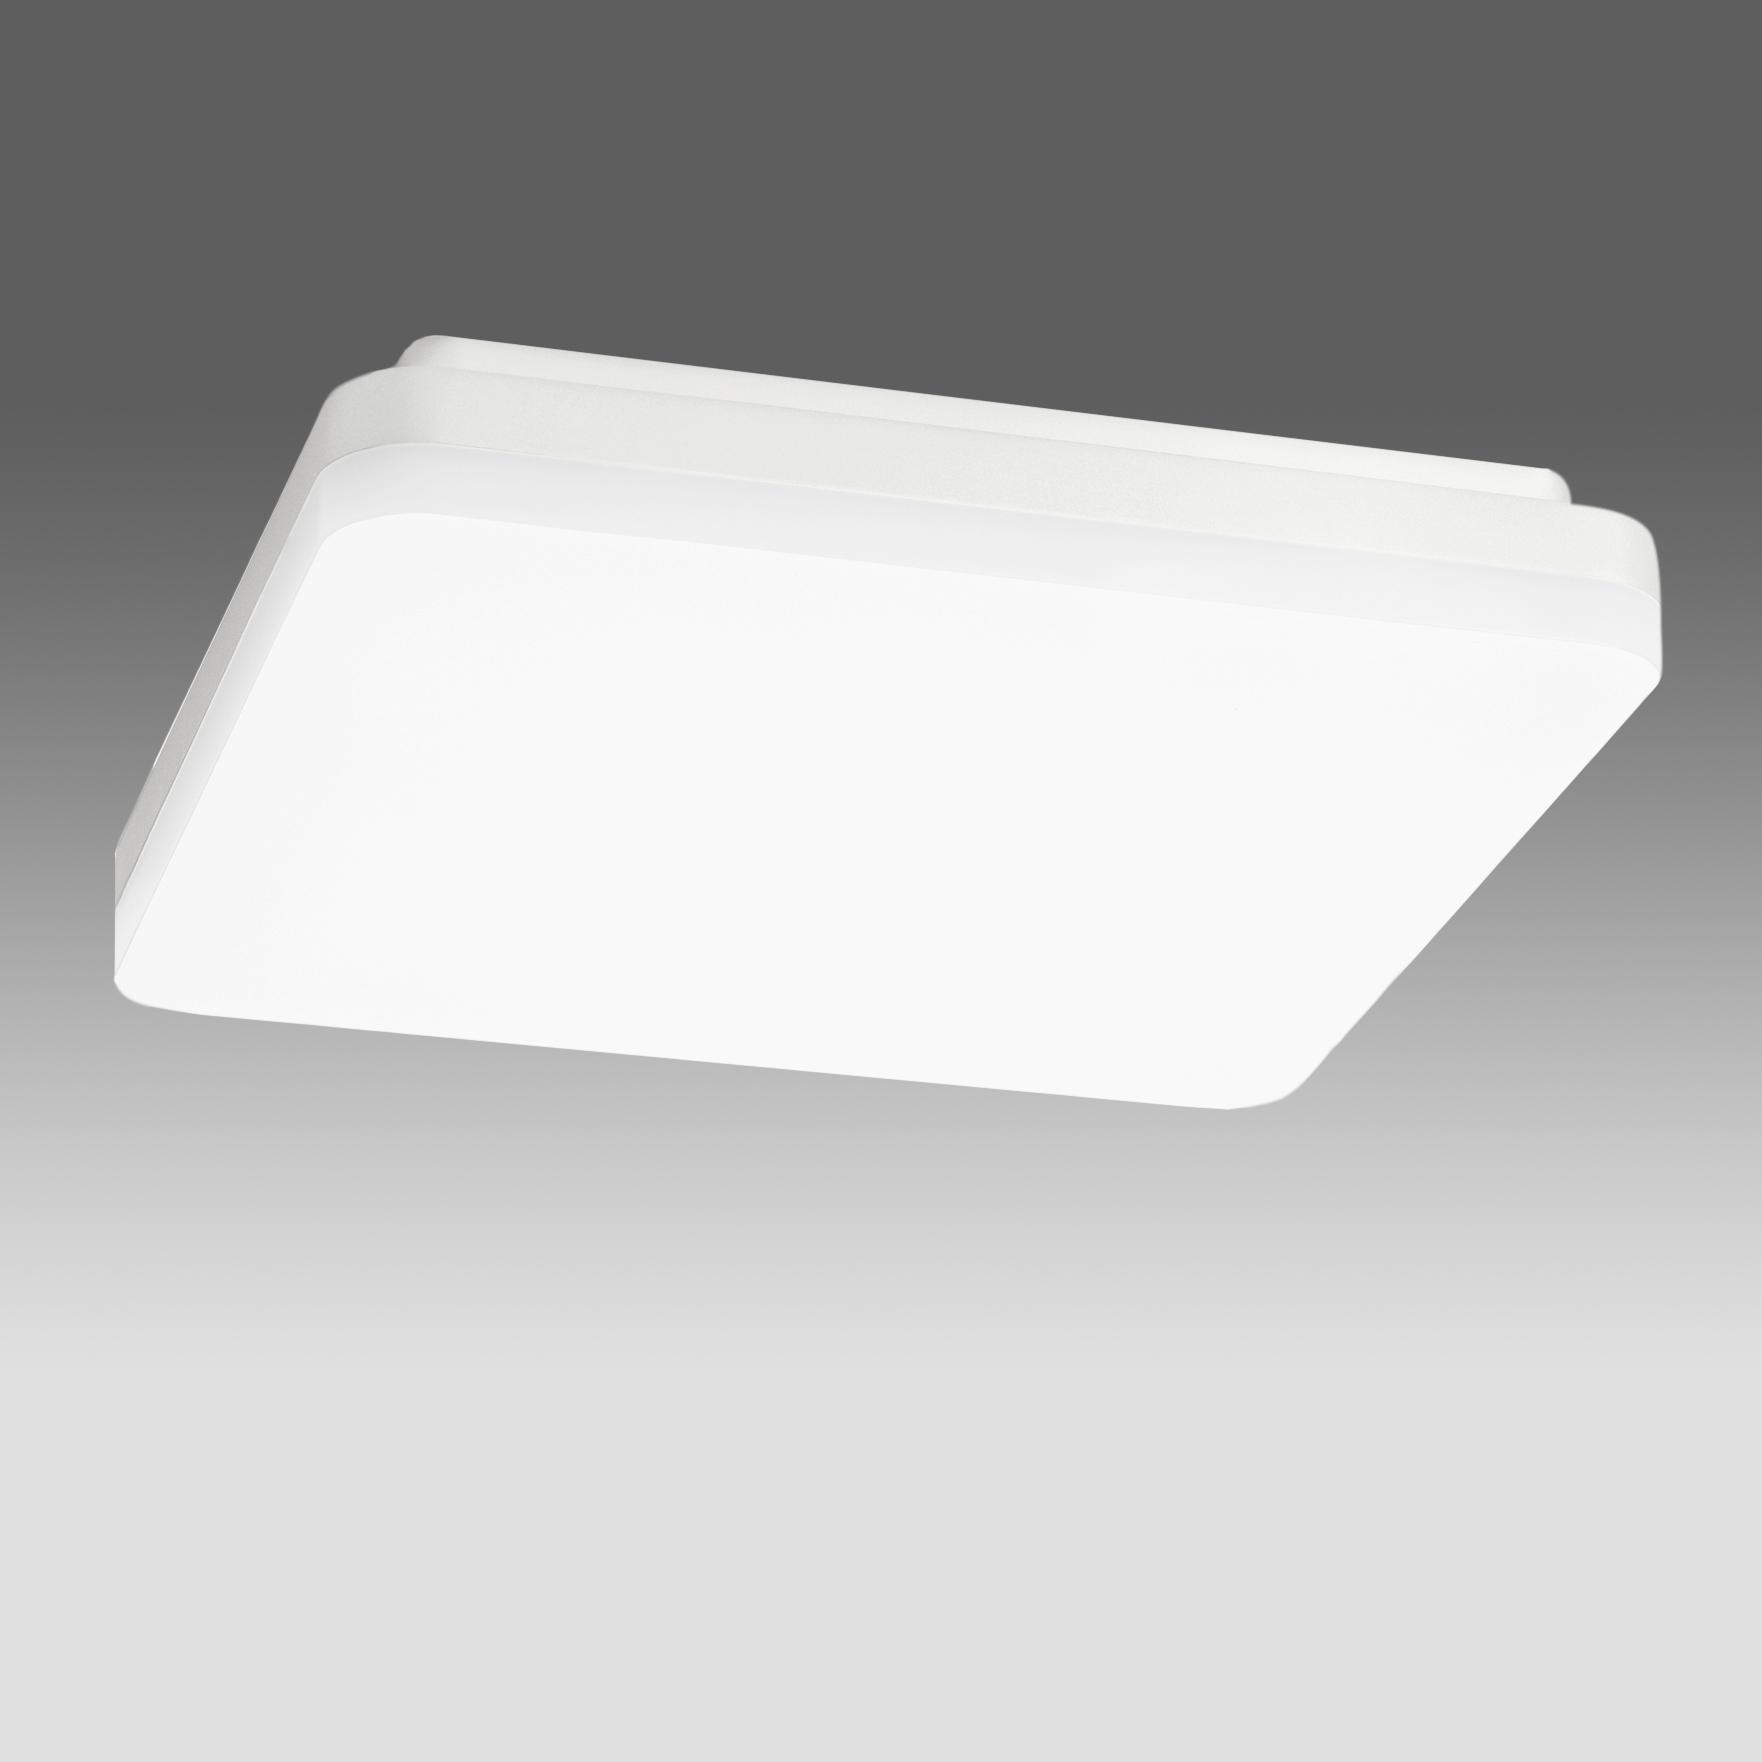 1 Stk Elegance Square III 27W 2800lm 4000K Sensor IP20 weiß LILE0043--